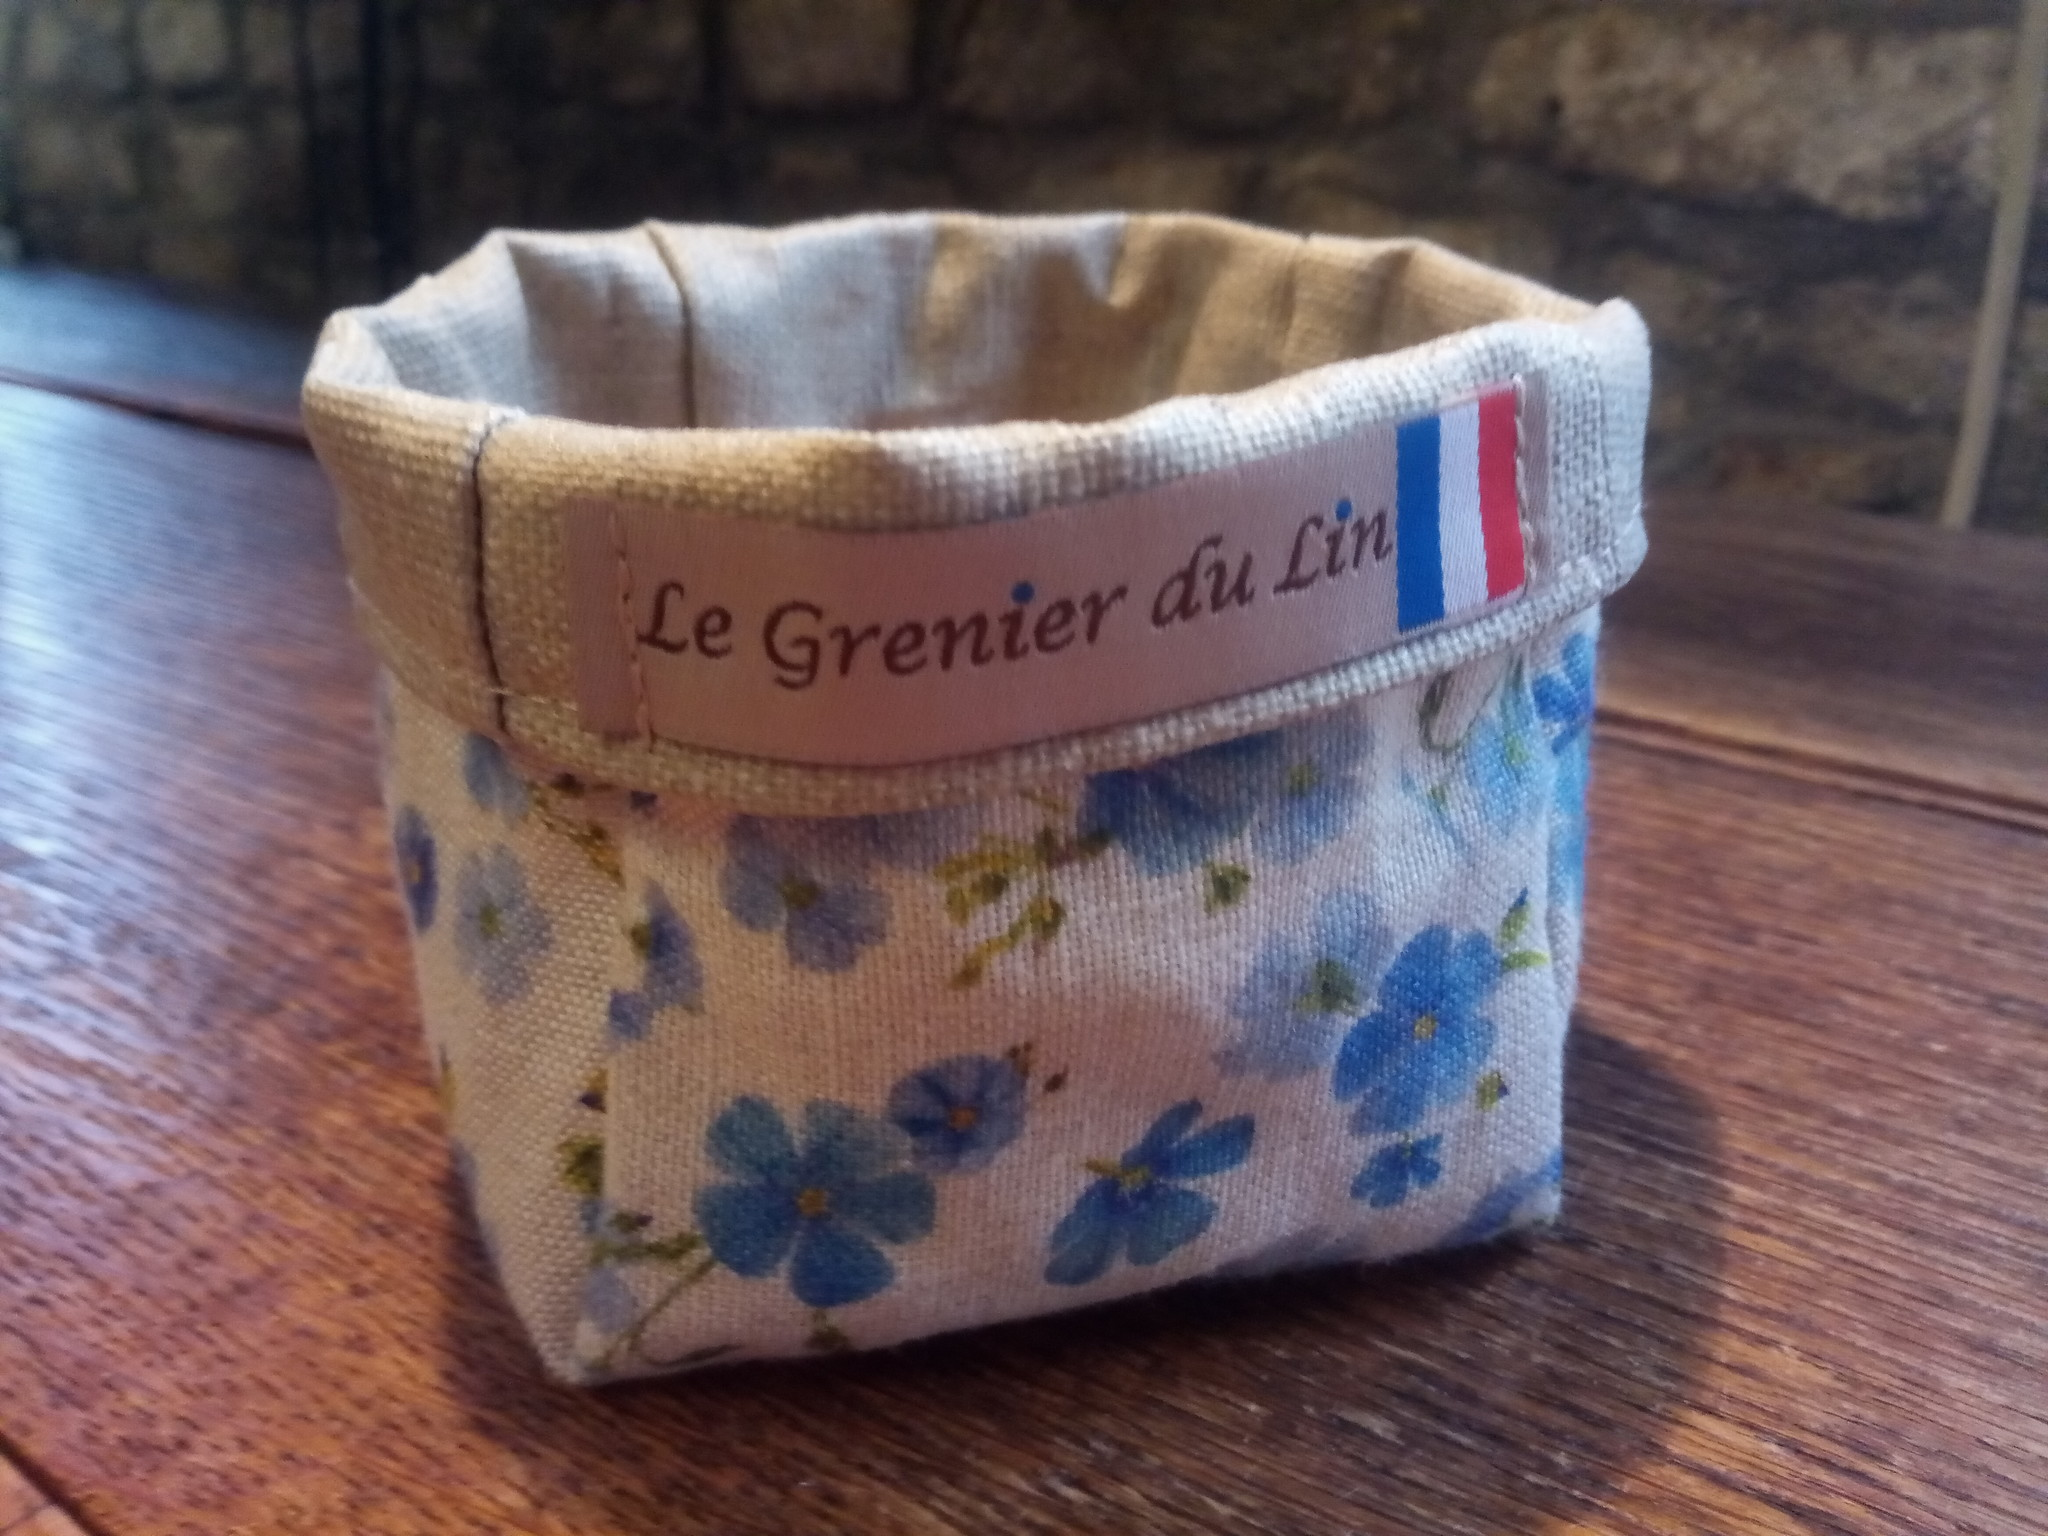 "Le grenier du lin Small ""linen flower"" pouch"